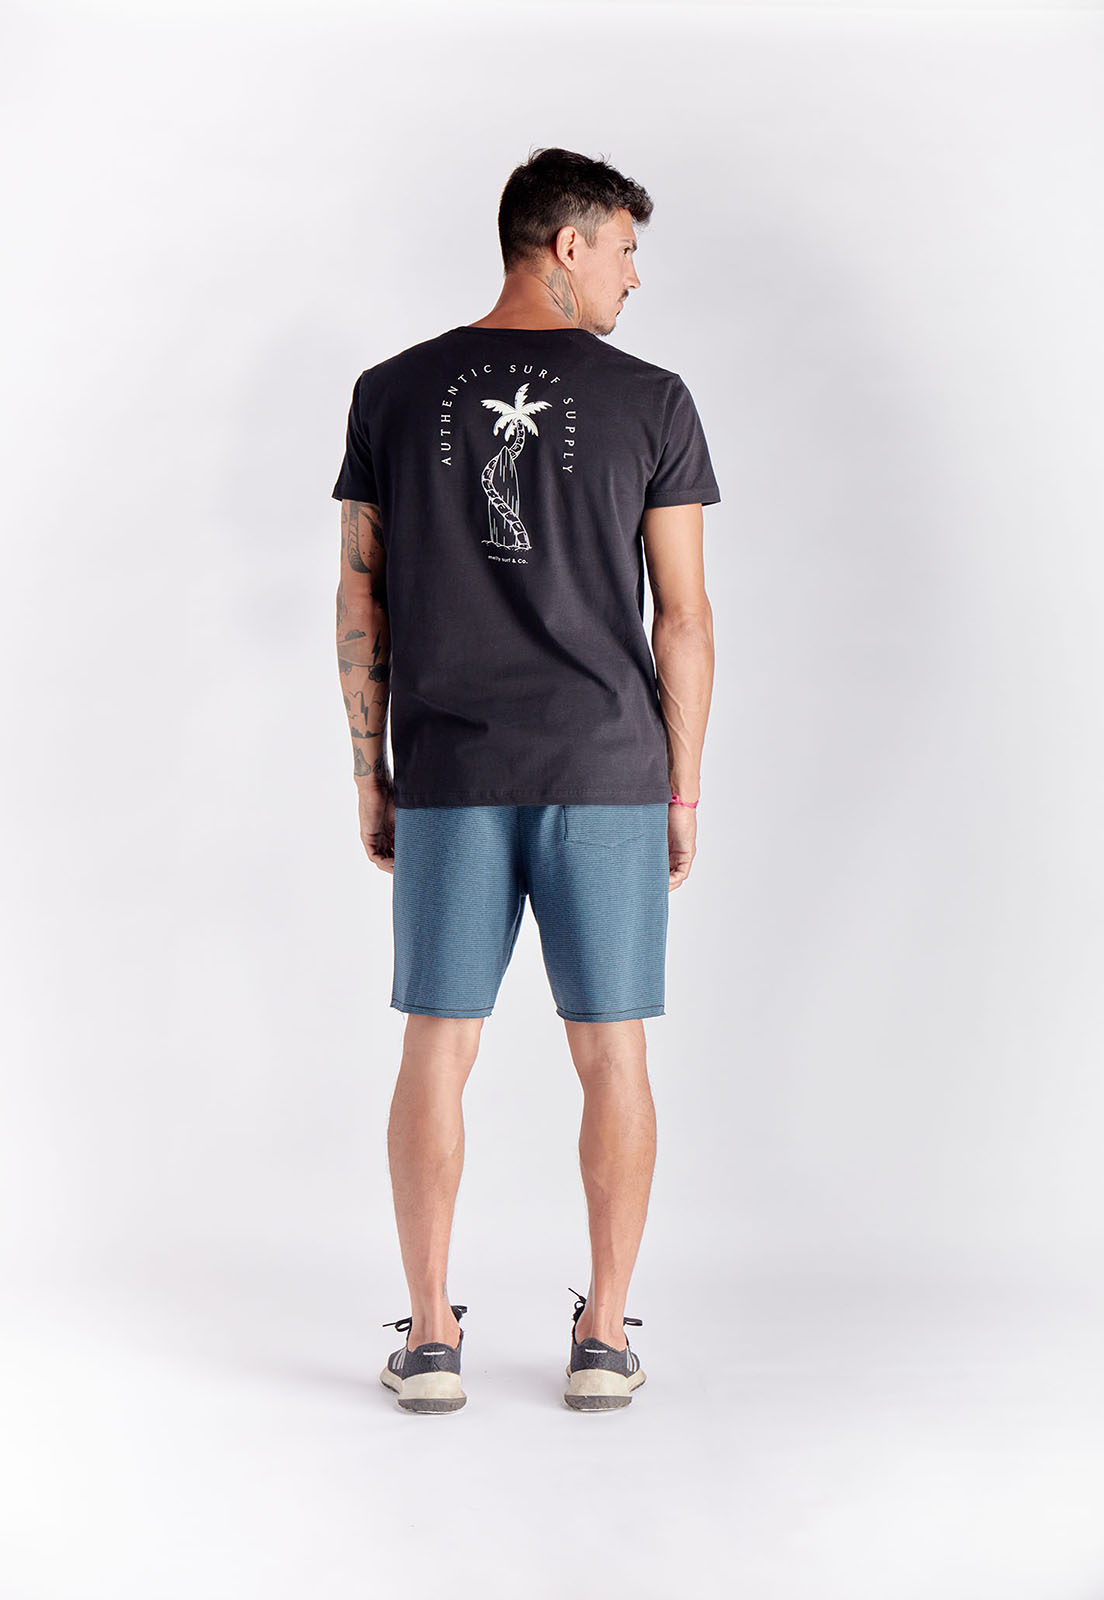 T-shirt Surf Supply Preto Melty